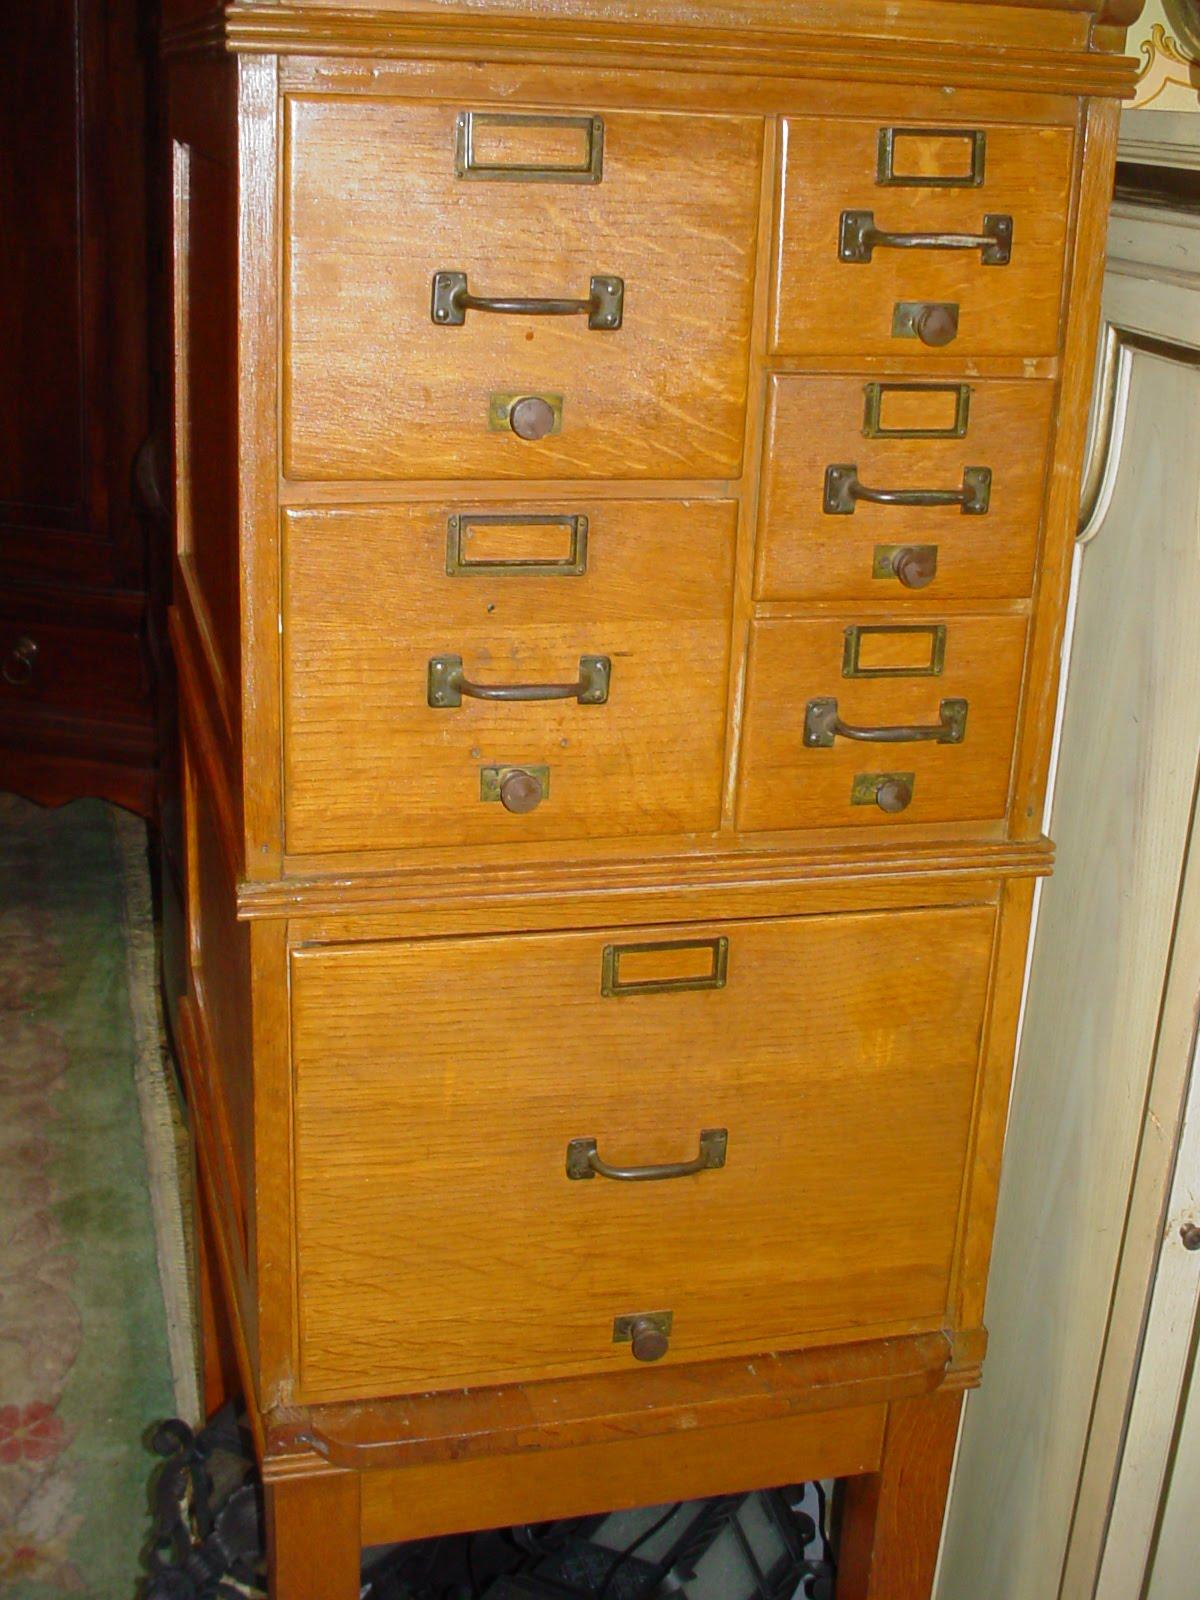 Fantastic Antique Oak Library File Cabinet - Park Estate Co.: Fantastic Antique Oak Library File Cabinet